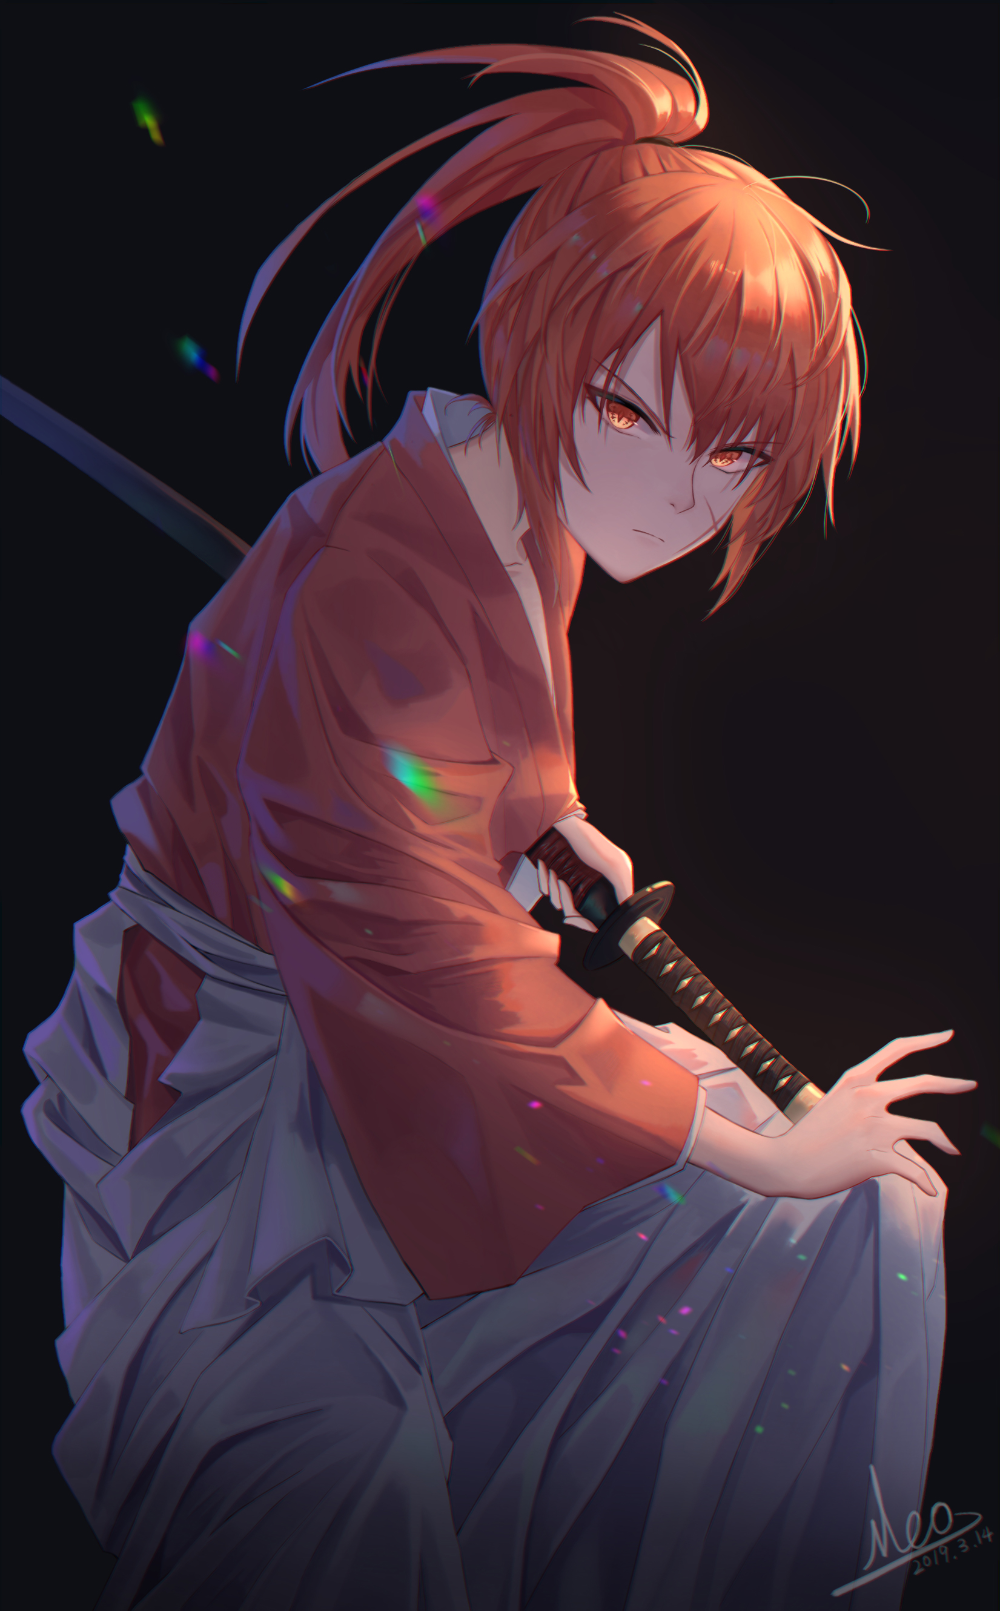 Himura Kenshin/2516247 Fullsize Image (1651x2661